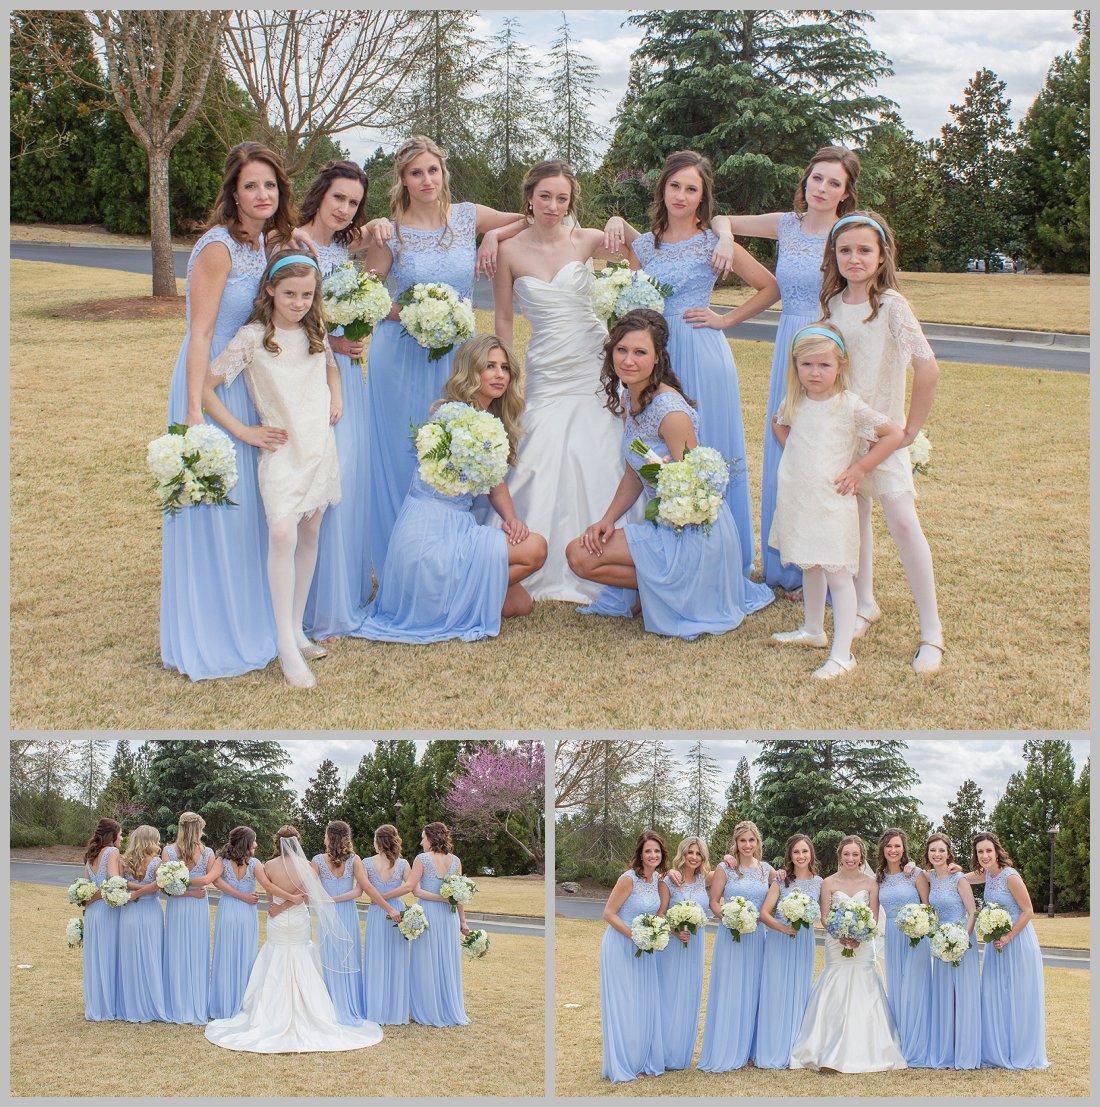 river-club-wedding-bridesmaids-03